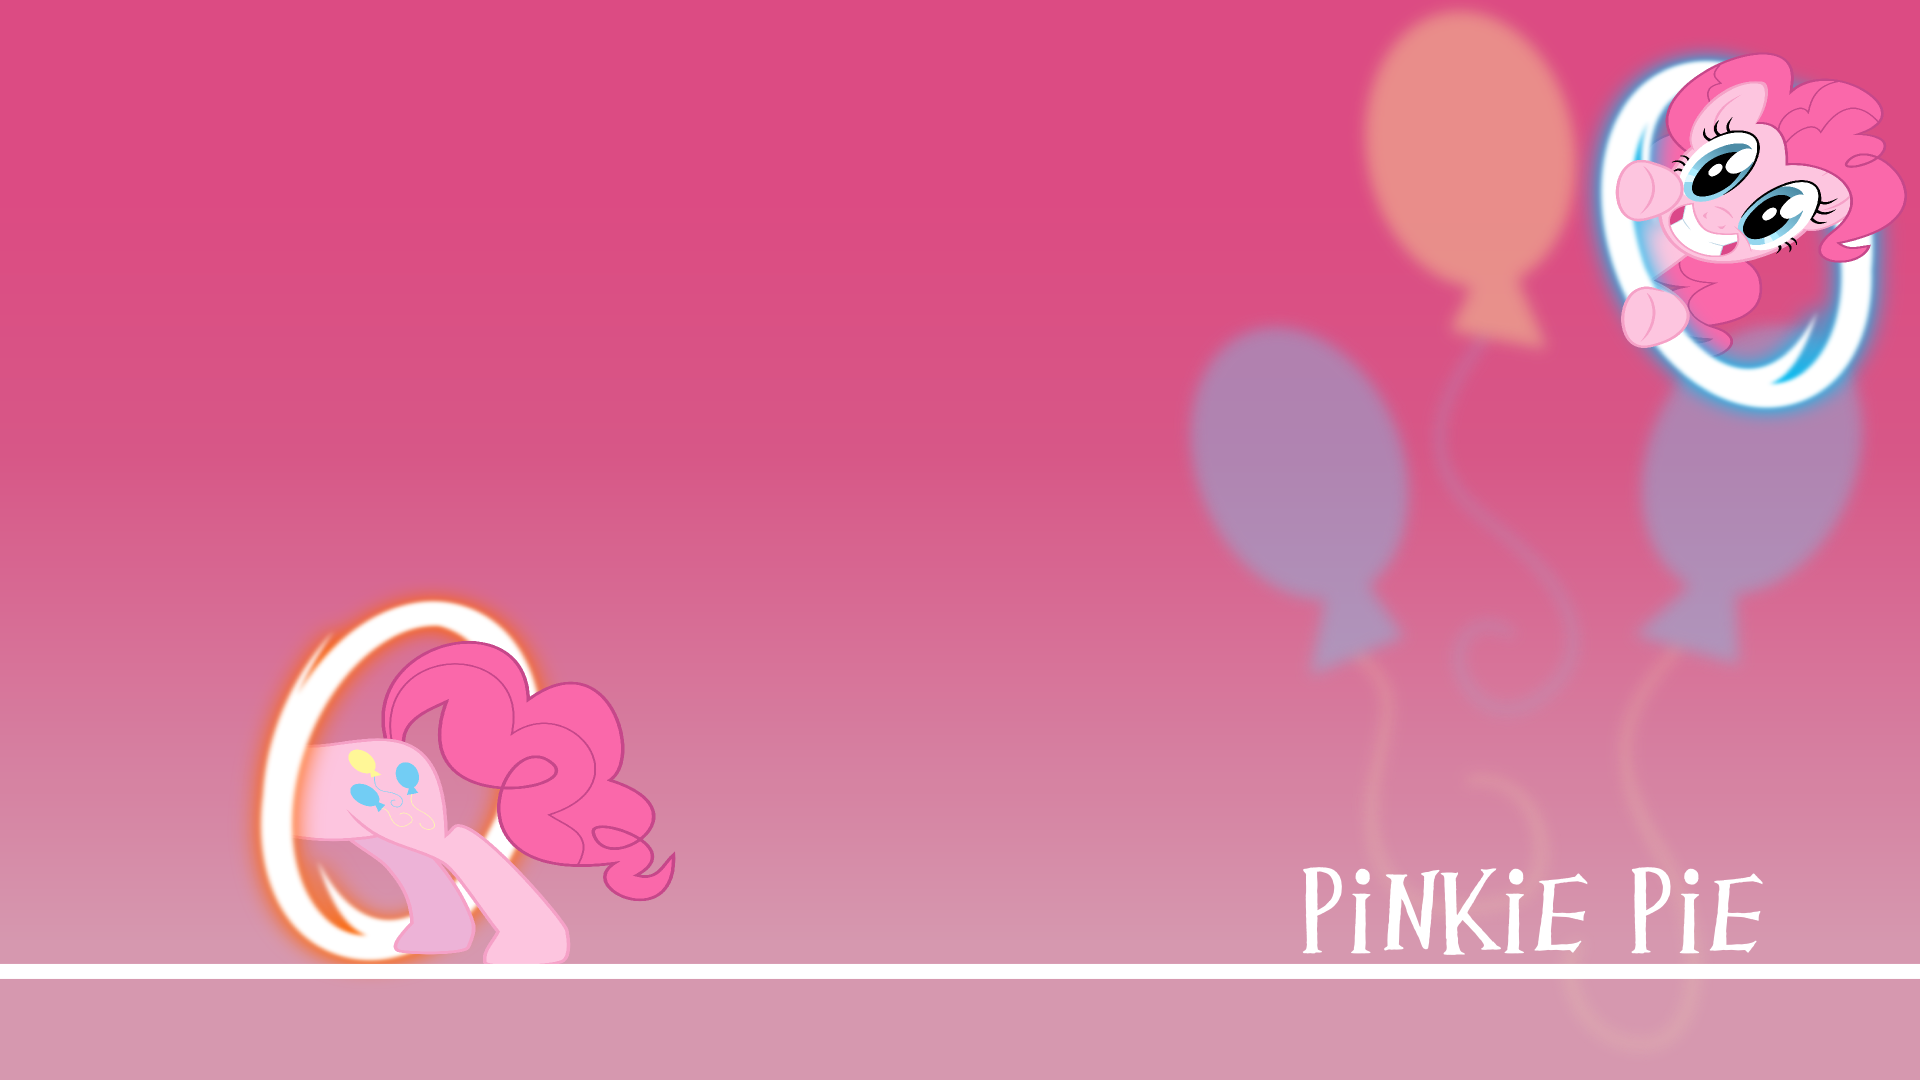 Pinkie Pie Portal WP by BlackGryph0n and Mac3030